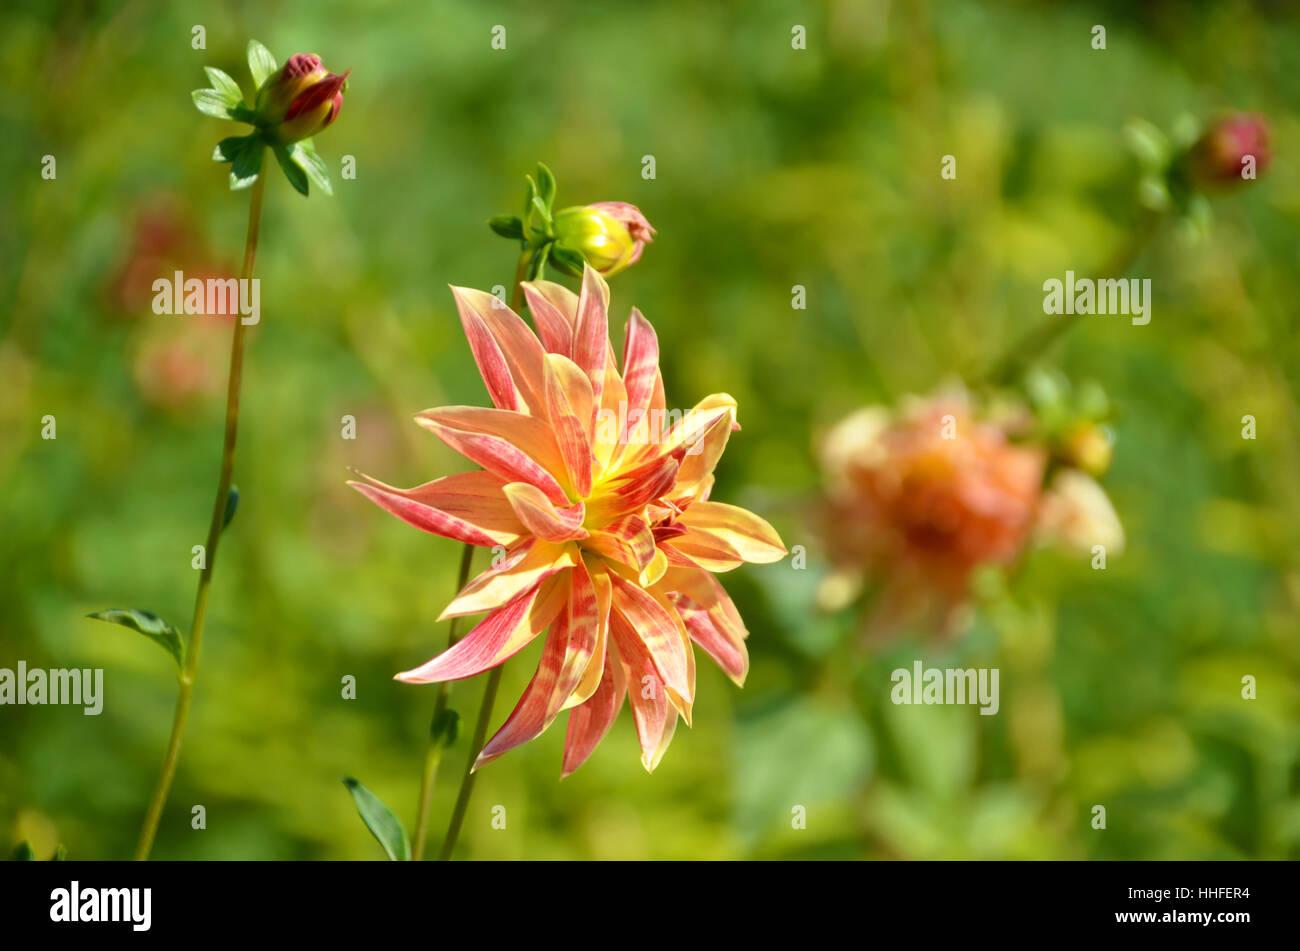 Garden, Plant, Dahlia, Gardens, Colour, Colors, Colours, Garden, Plant,  Flower